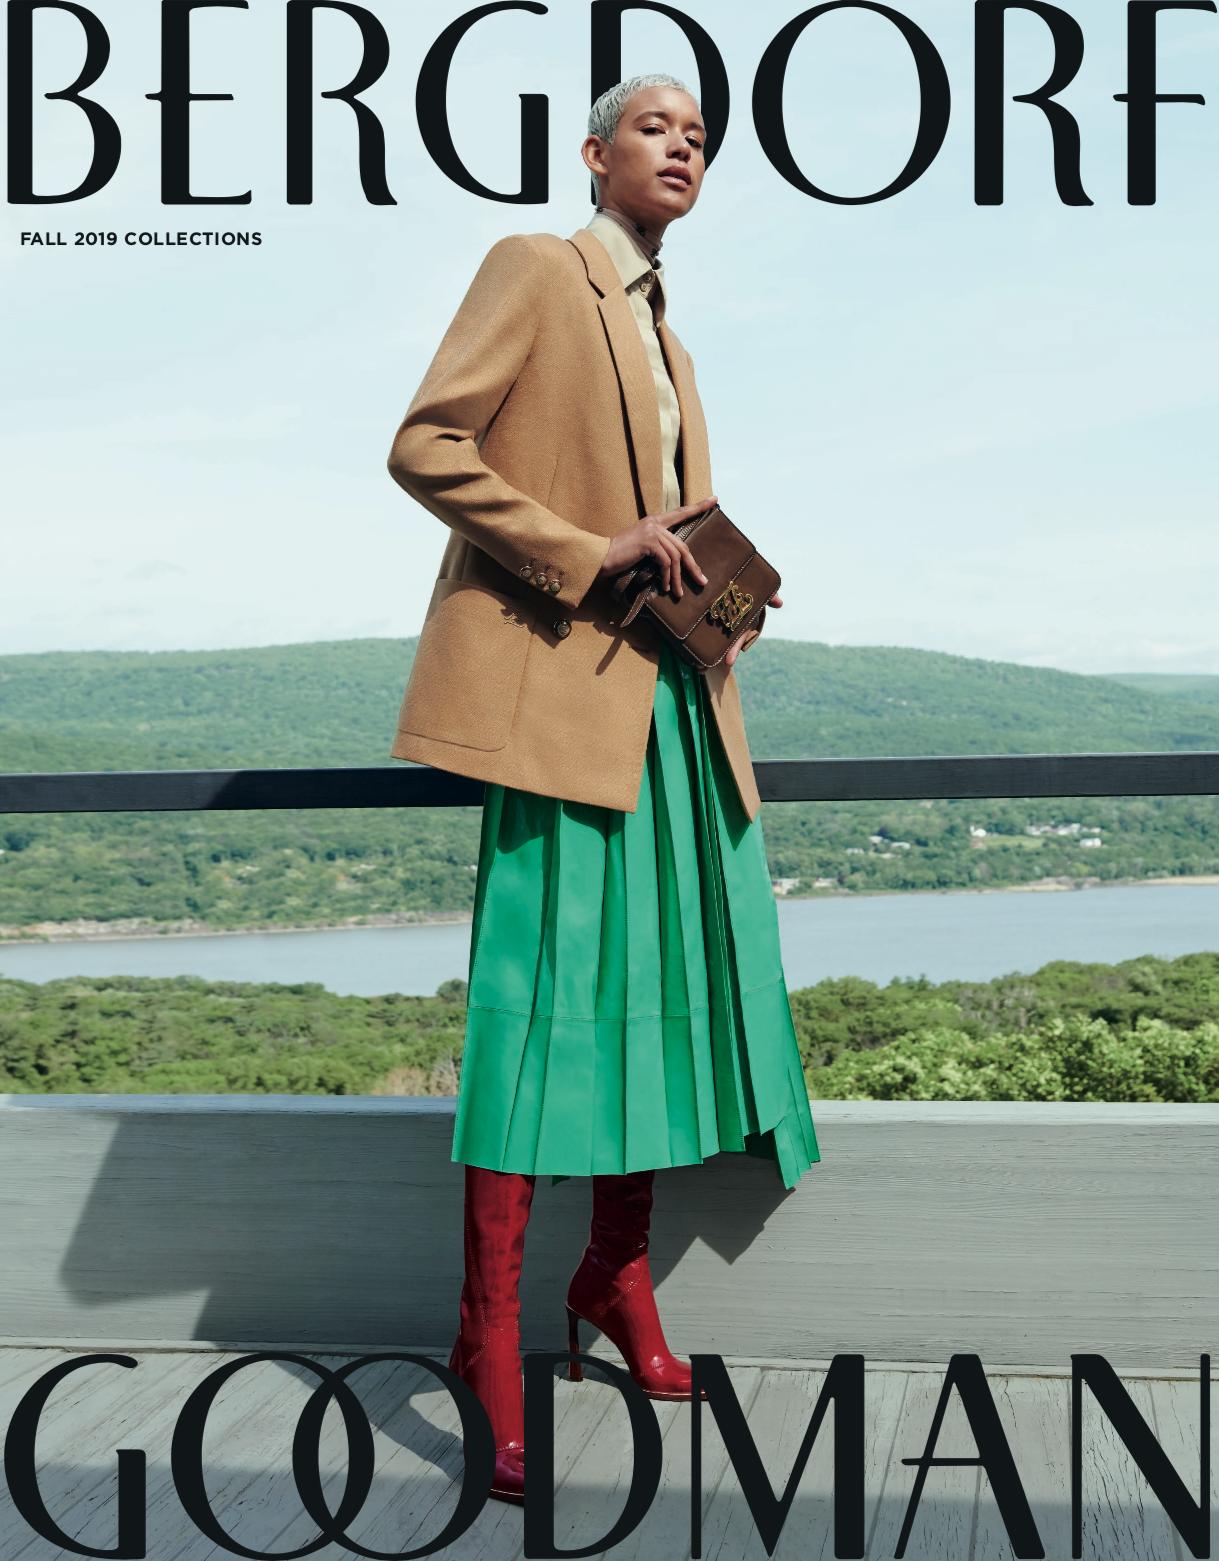 Tiffany Nicholson x Bergdorf Goodman